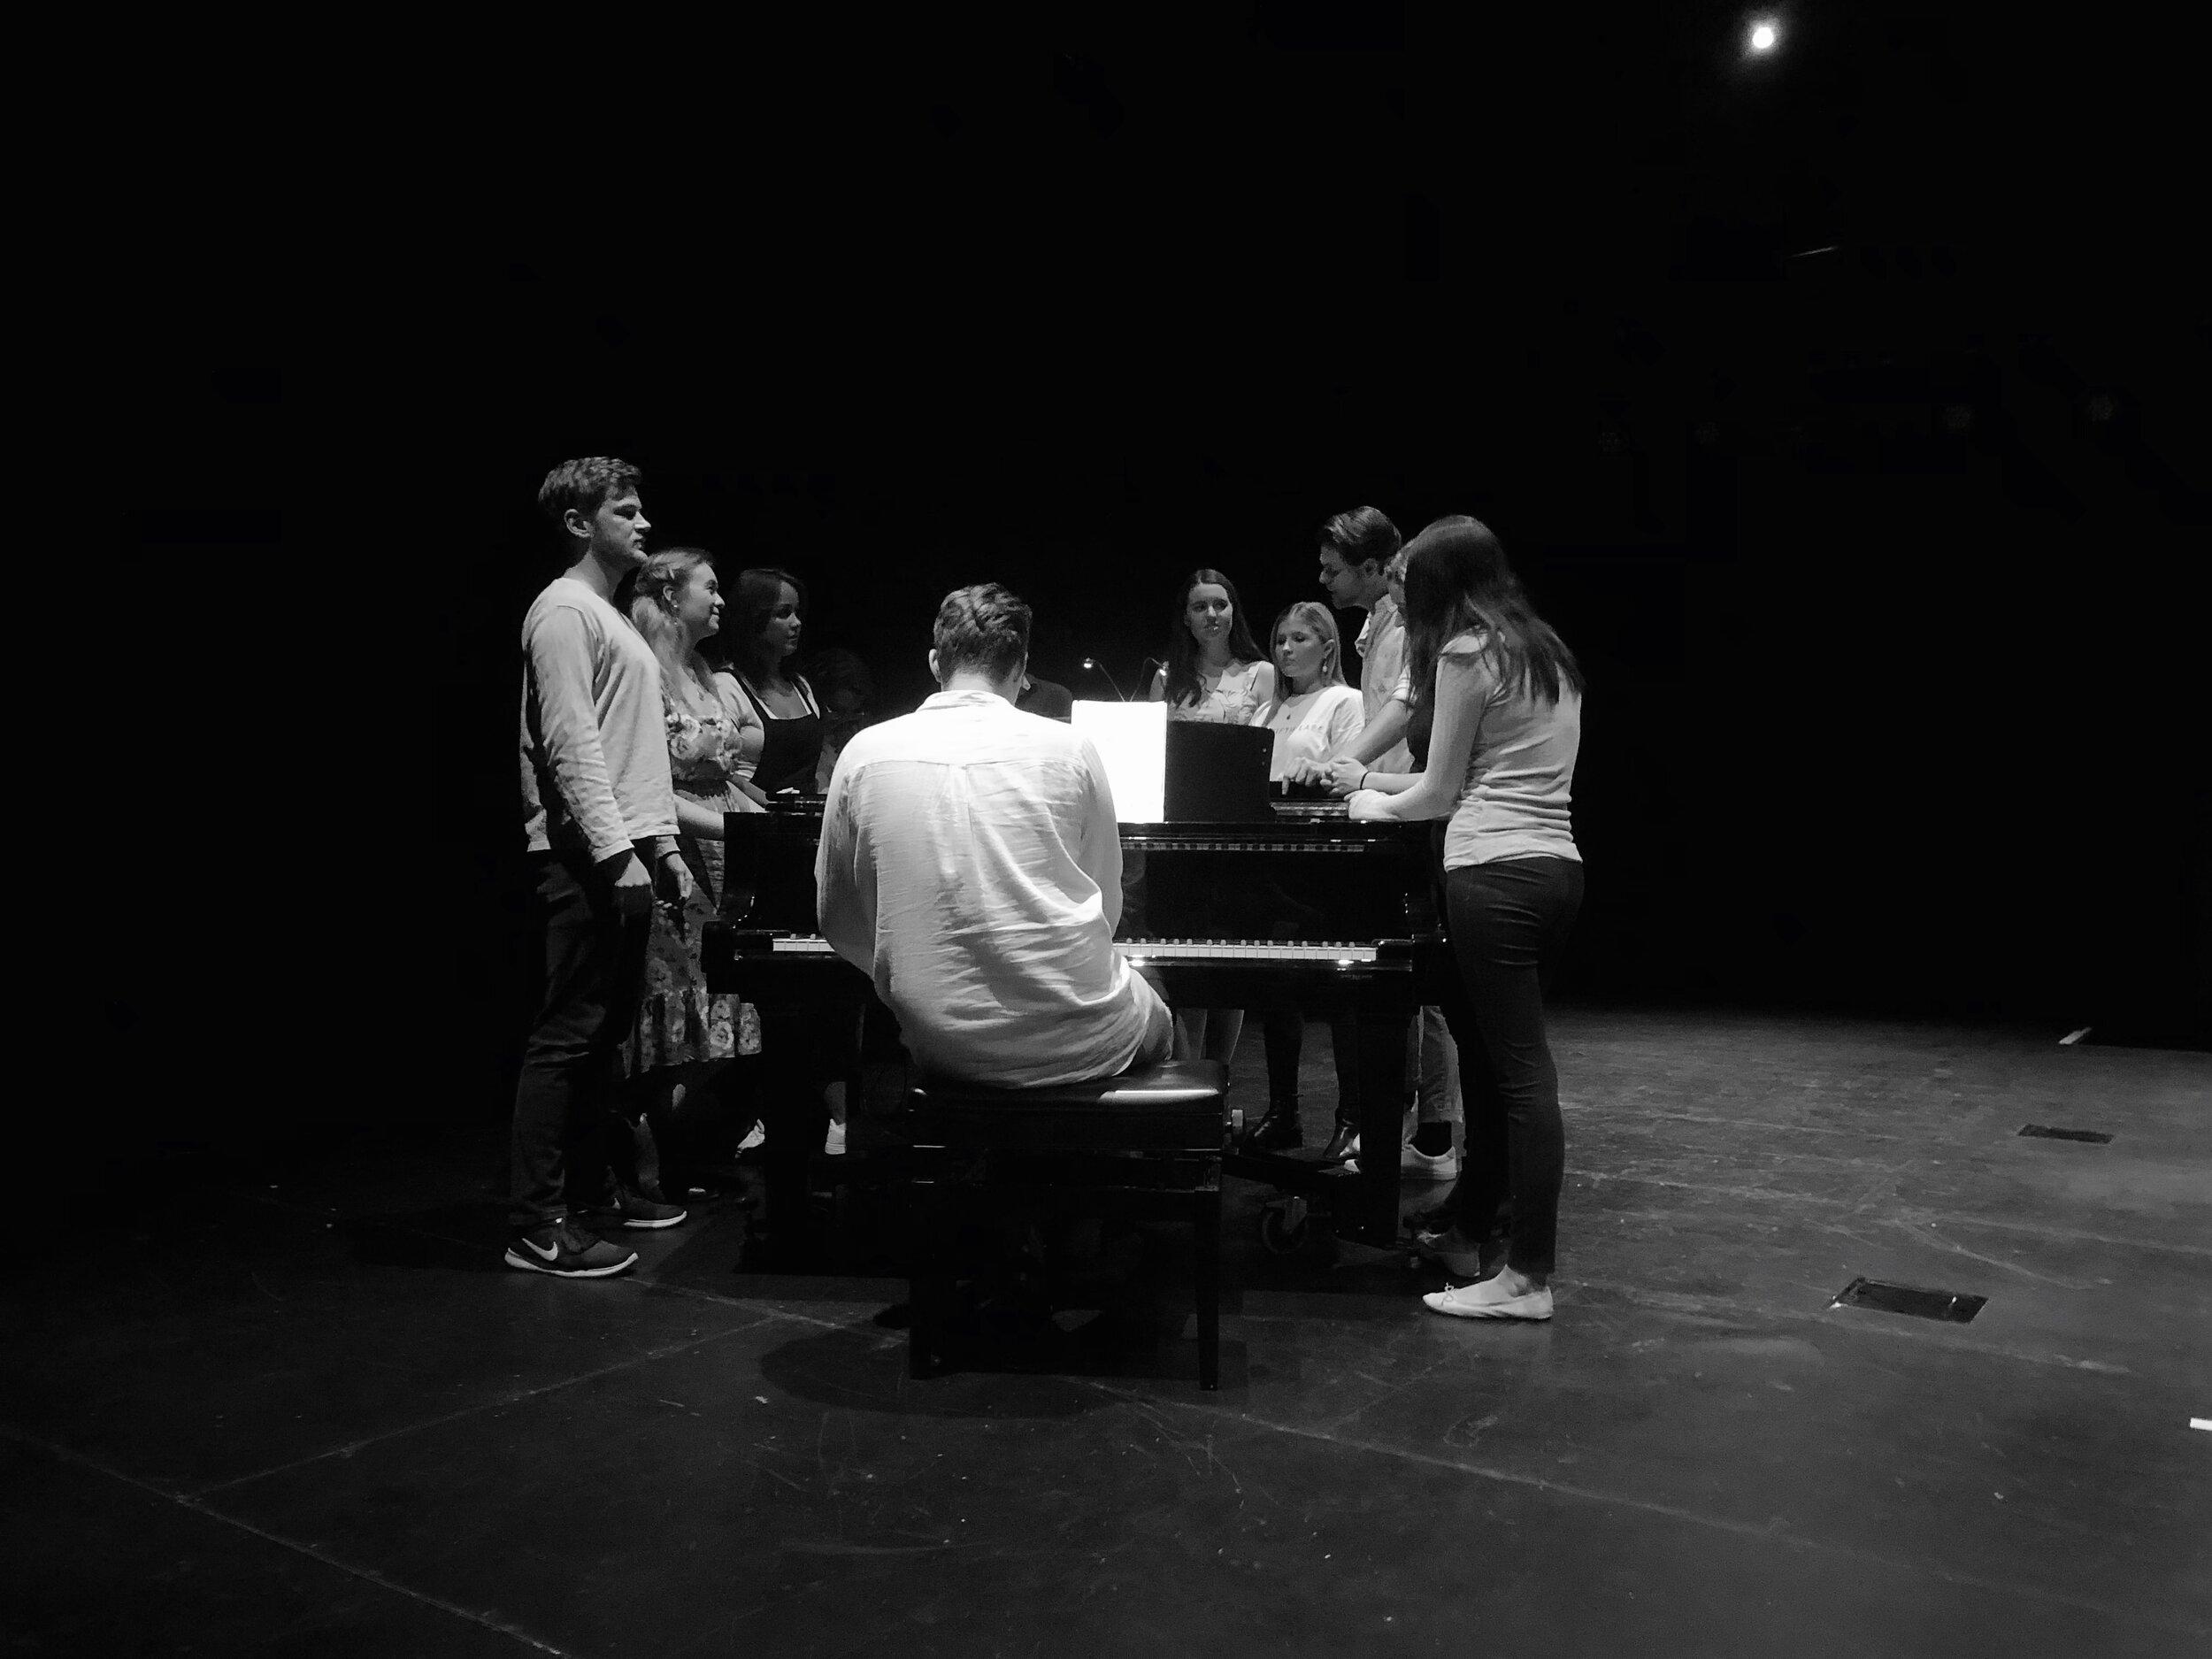 Tales of Foveaux - Zach Selmes tells us more about Reprise Theatre Co.